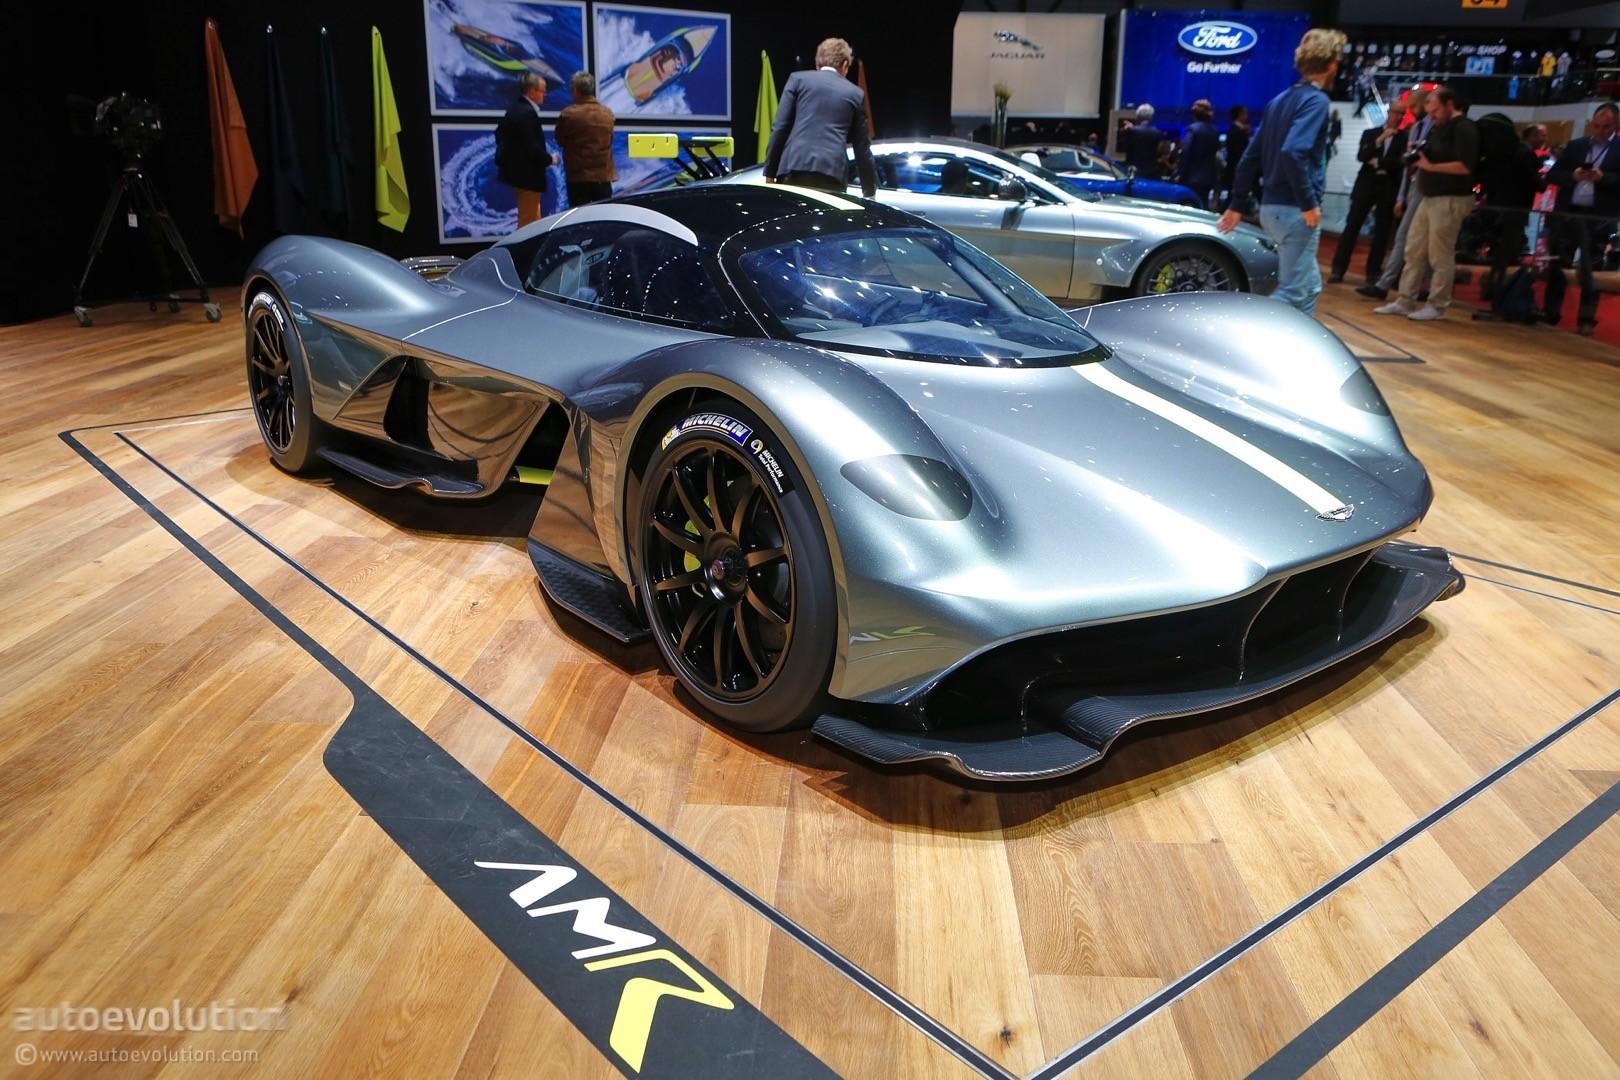 Ferrari-Rivaling Aston Martin Supercar Confirmed To Arrive ...